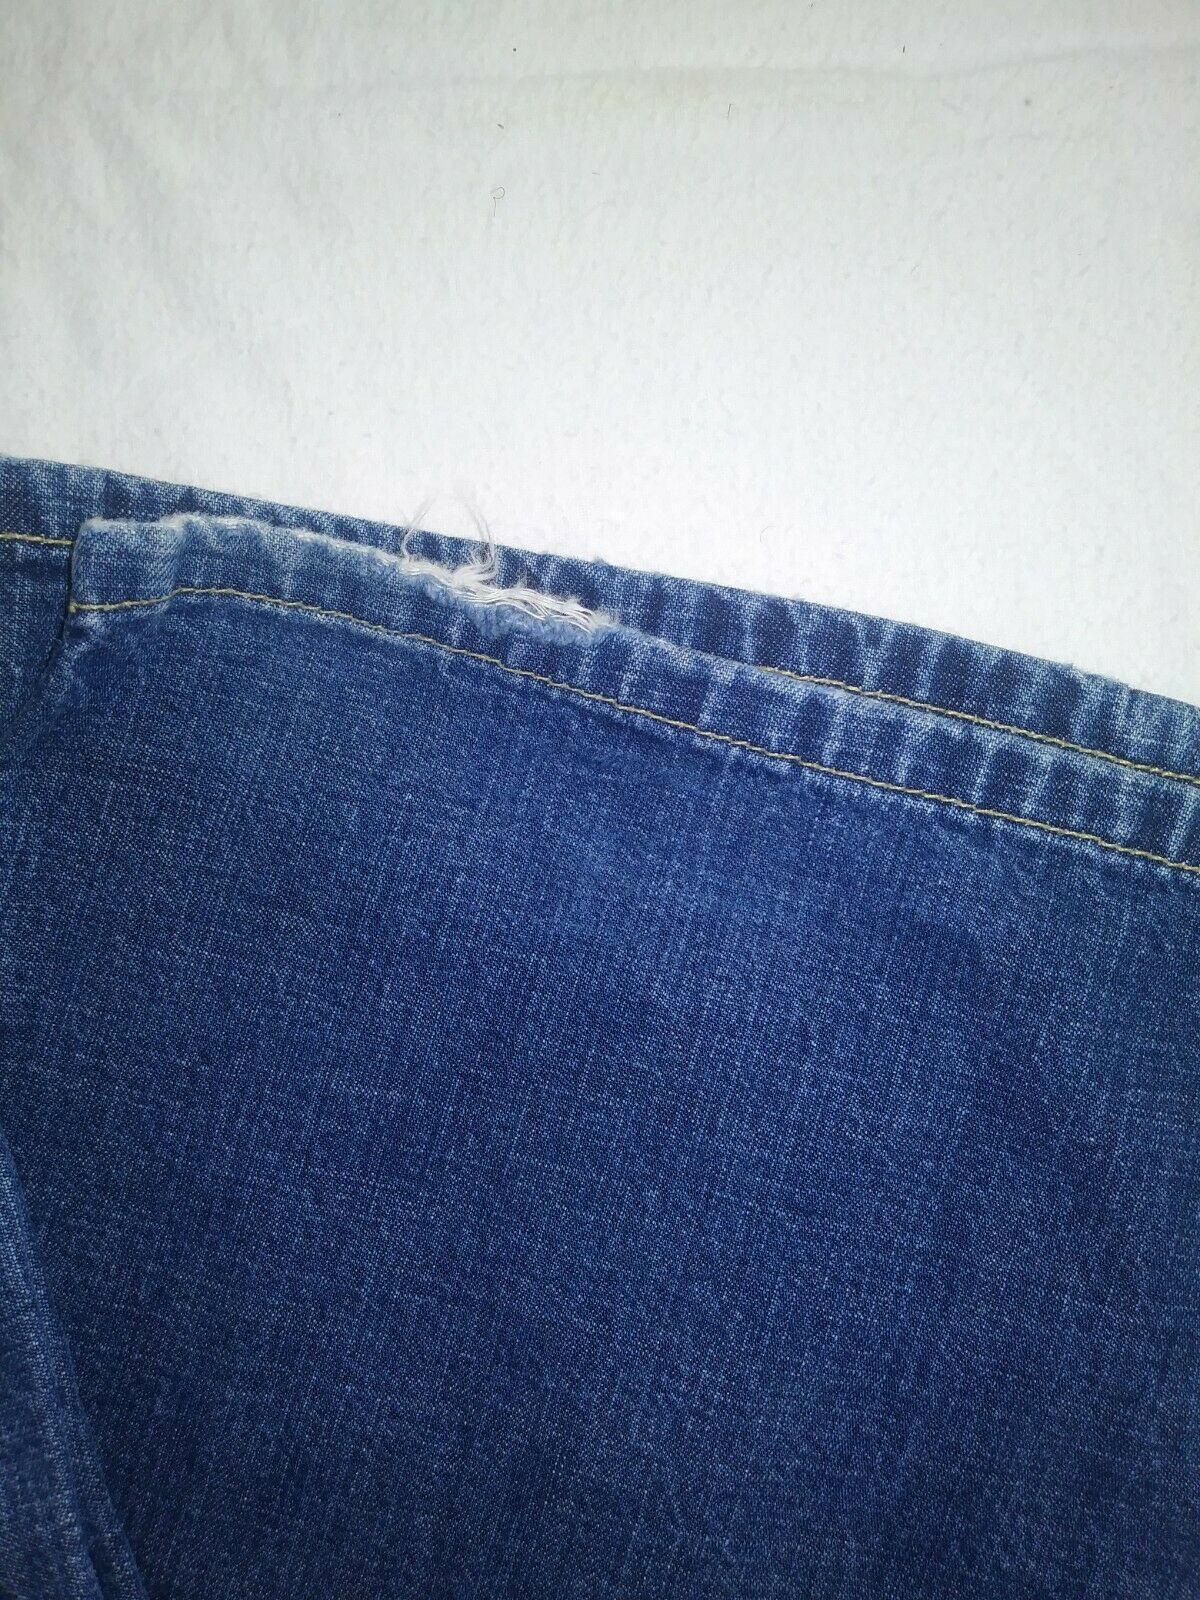 Women's Lucky Brand Dungarees Y2K Wide Leg Denim … - image 3